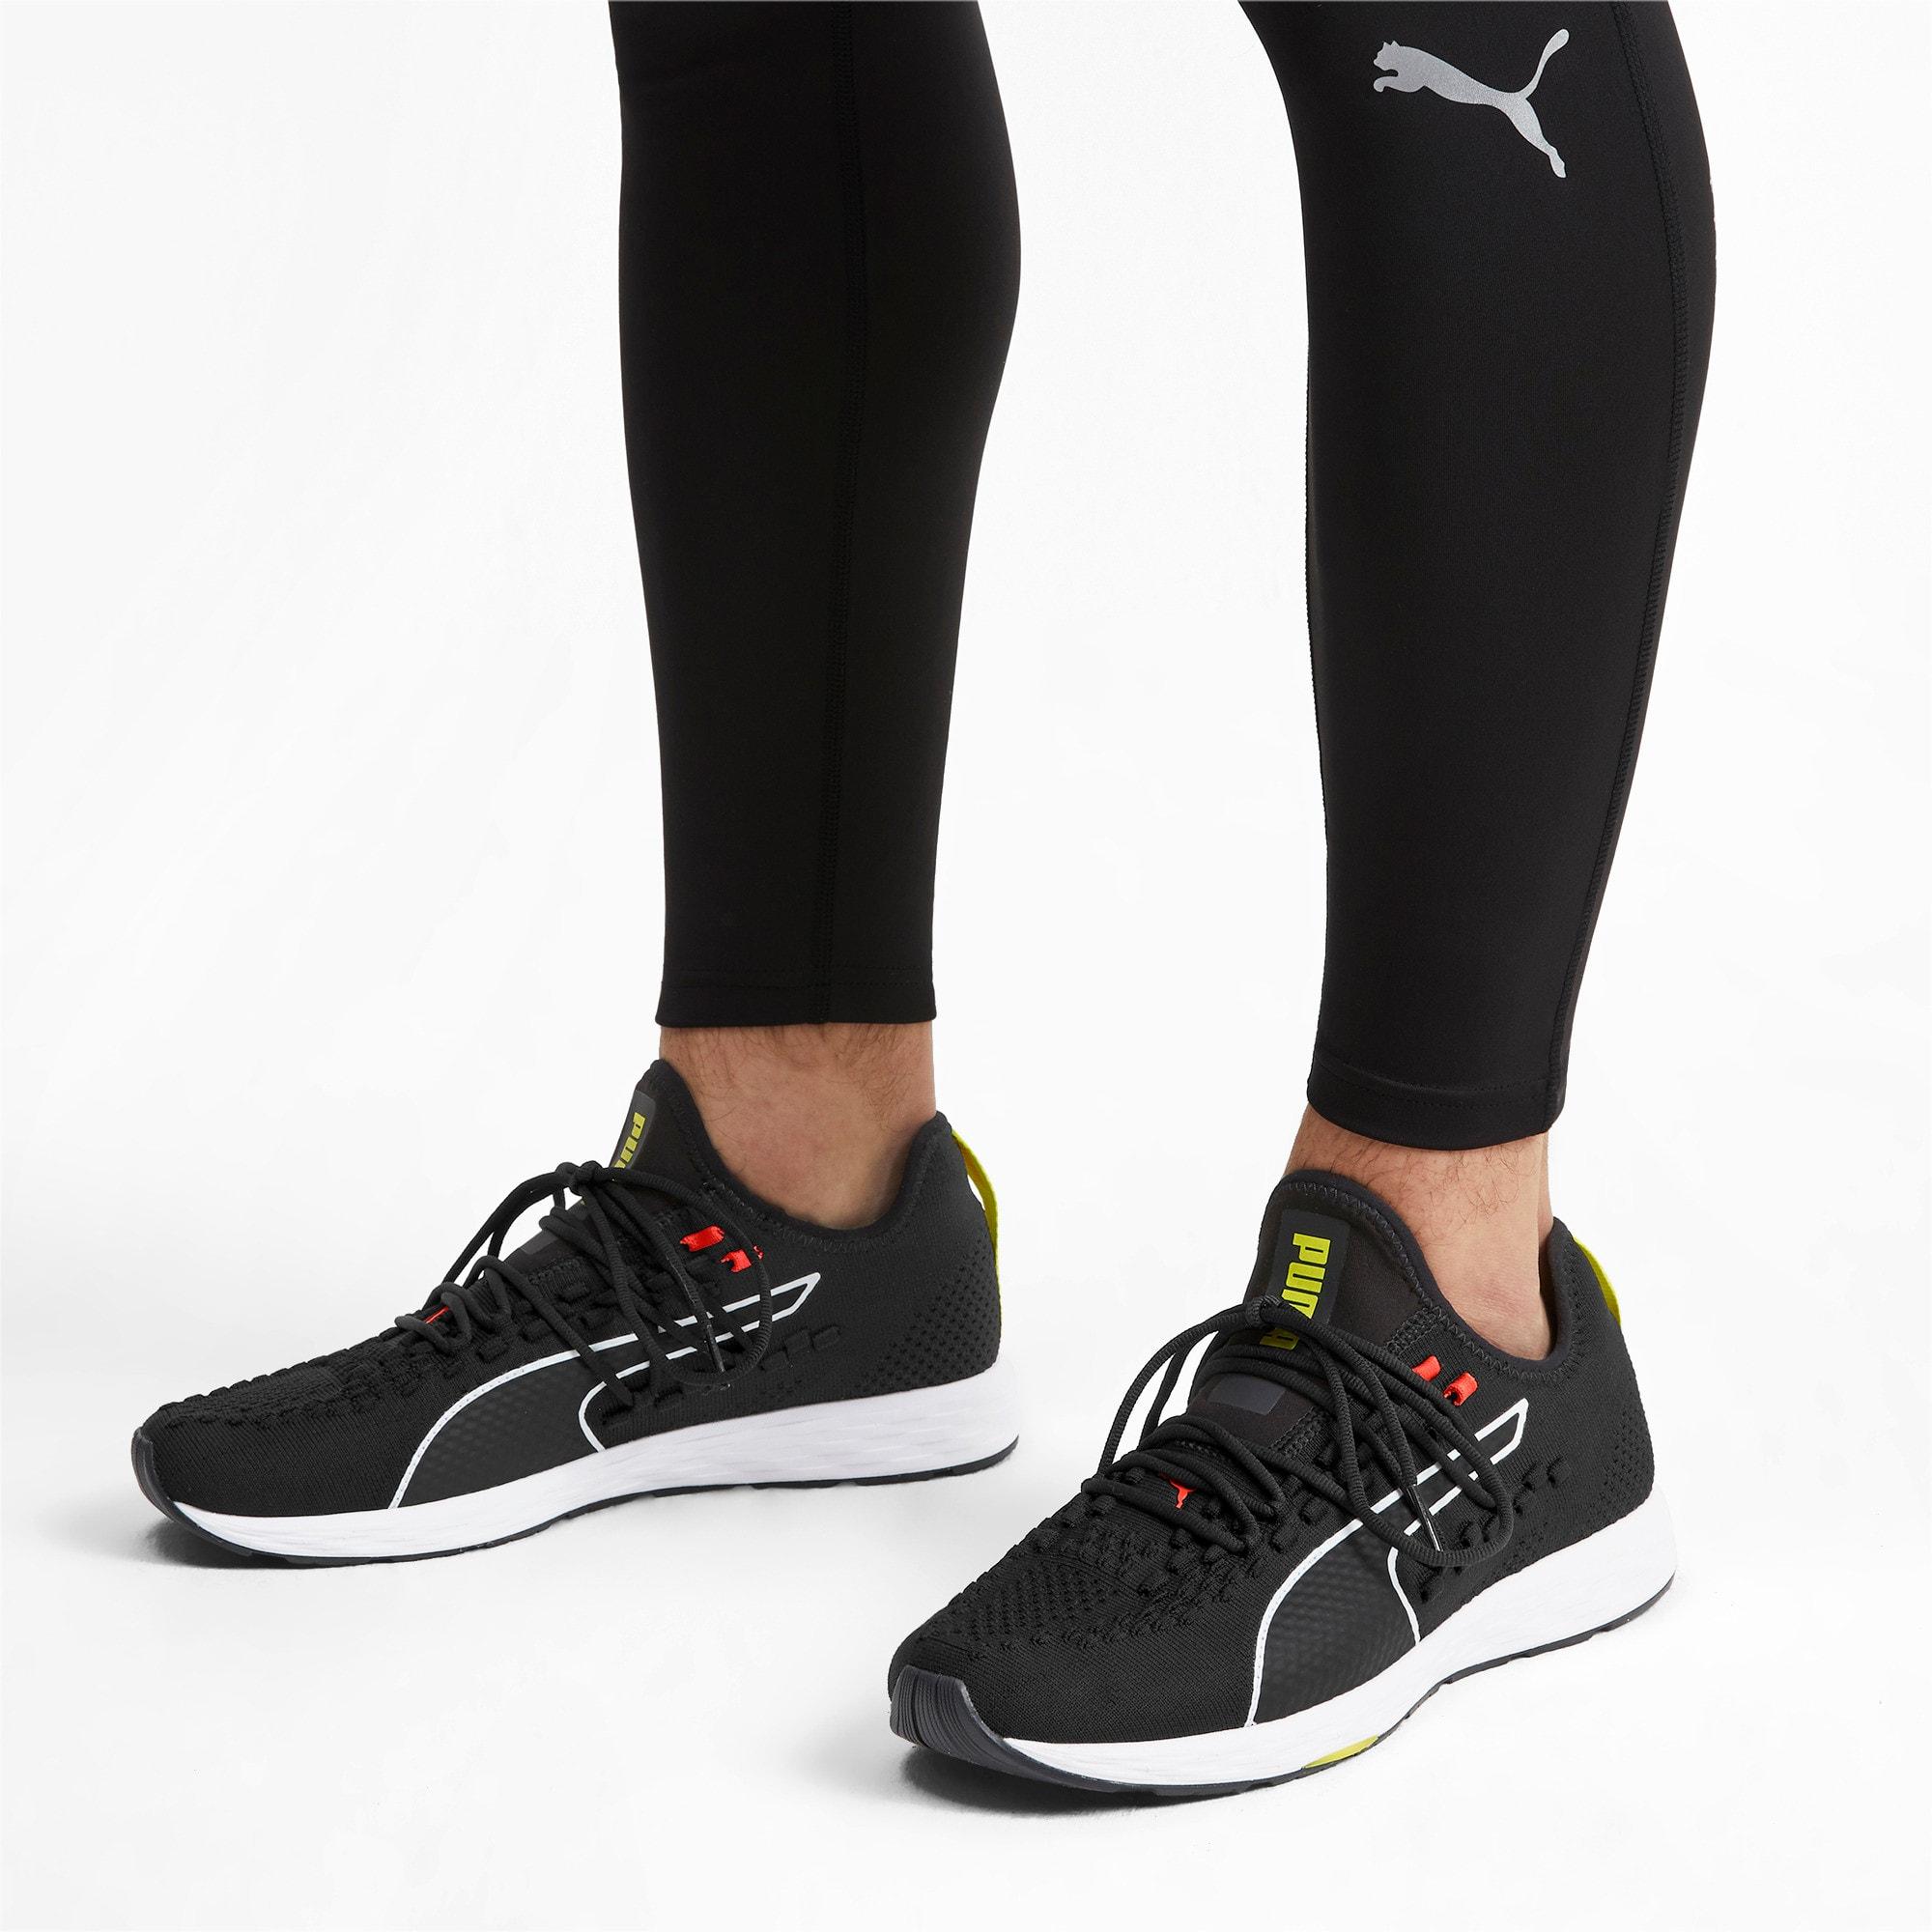 Thumbnail 2 of SPEED RACER Running Shoes, Black-Nrgy Red-Yellow Alert, medium